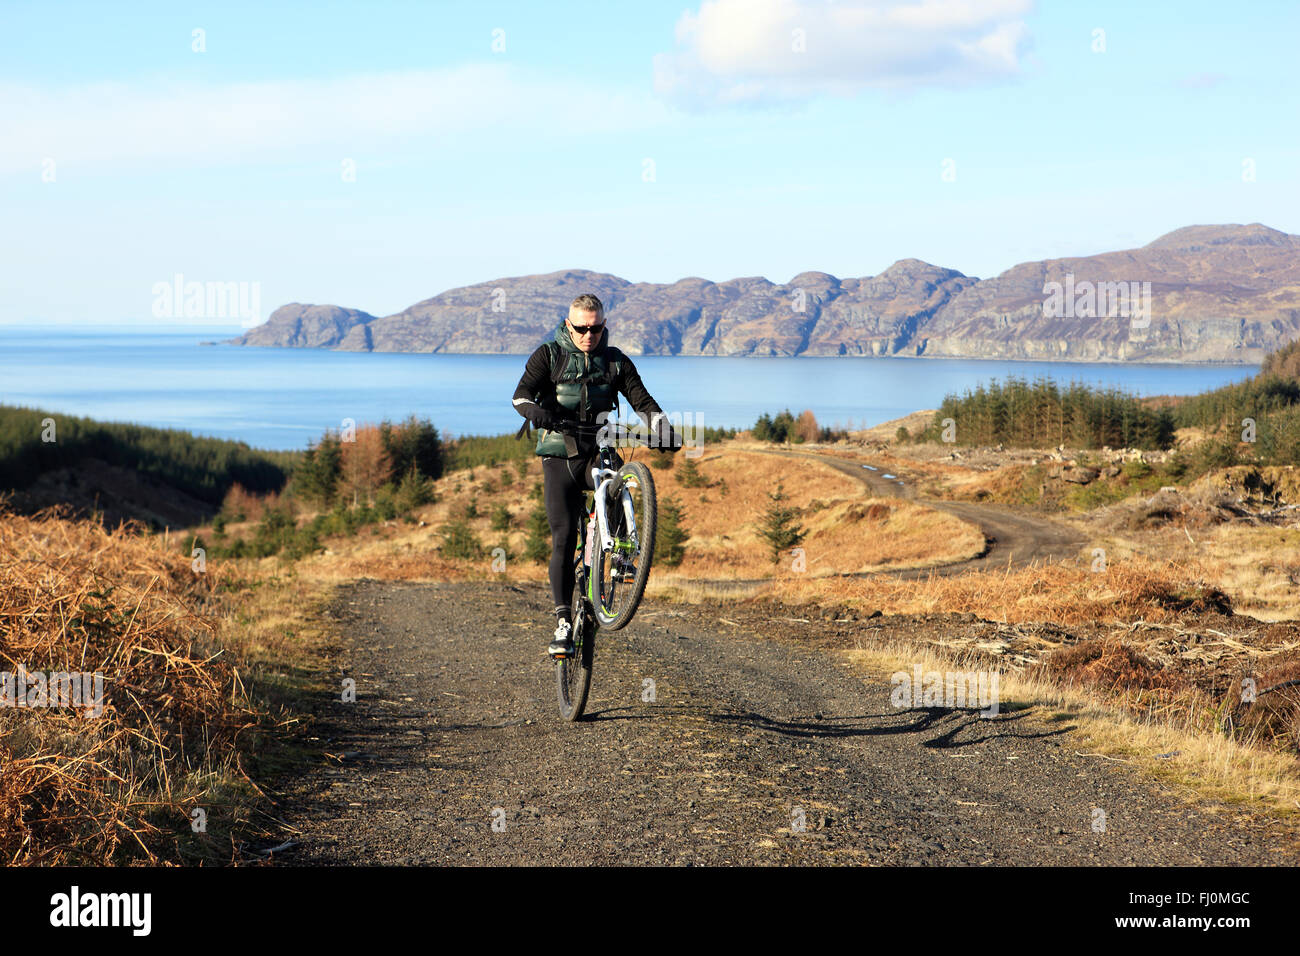 isle-of-mull-scotland-uk-27th-feb-2016-m